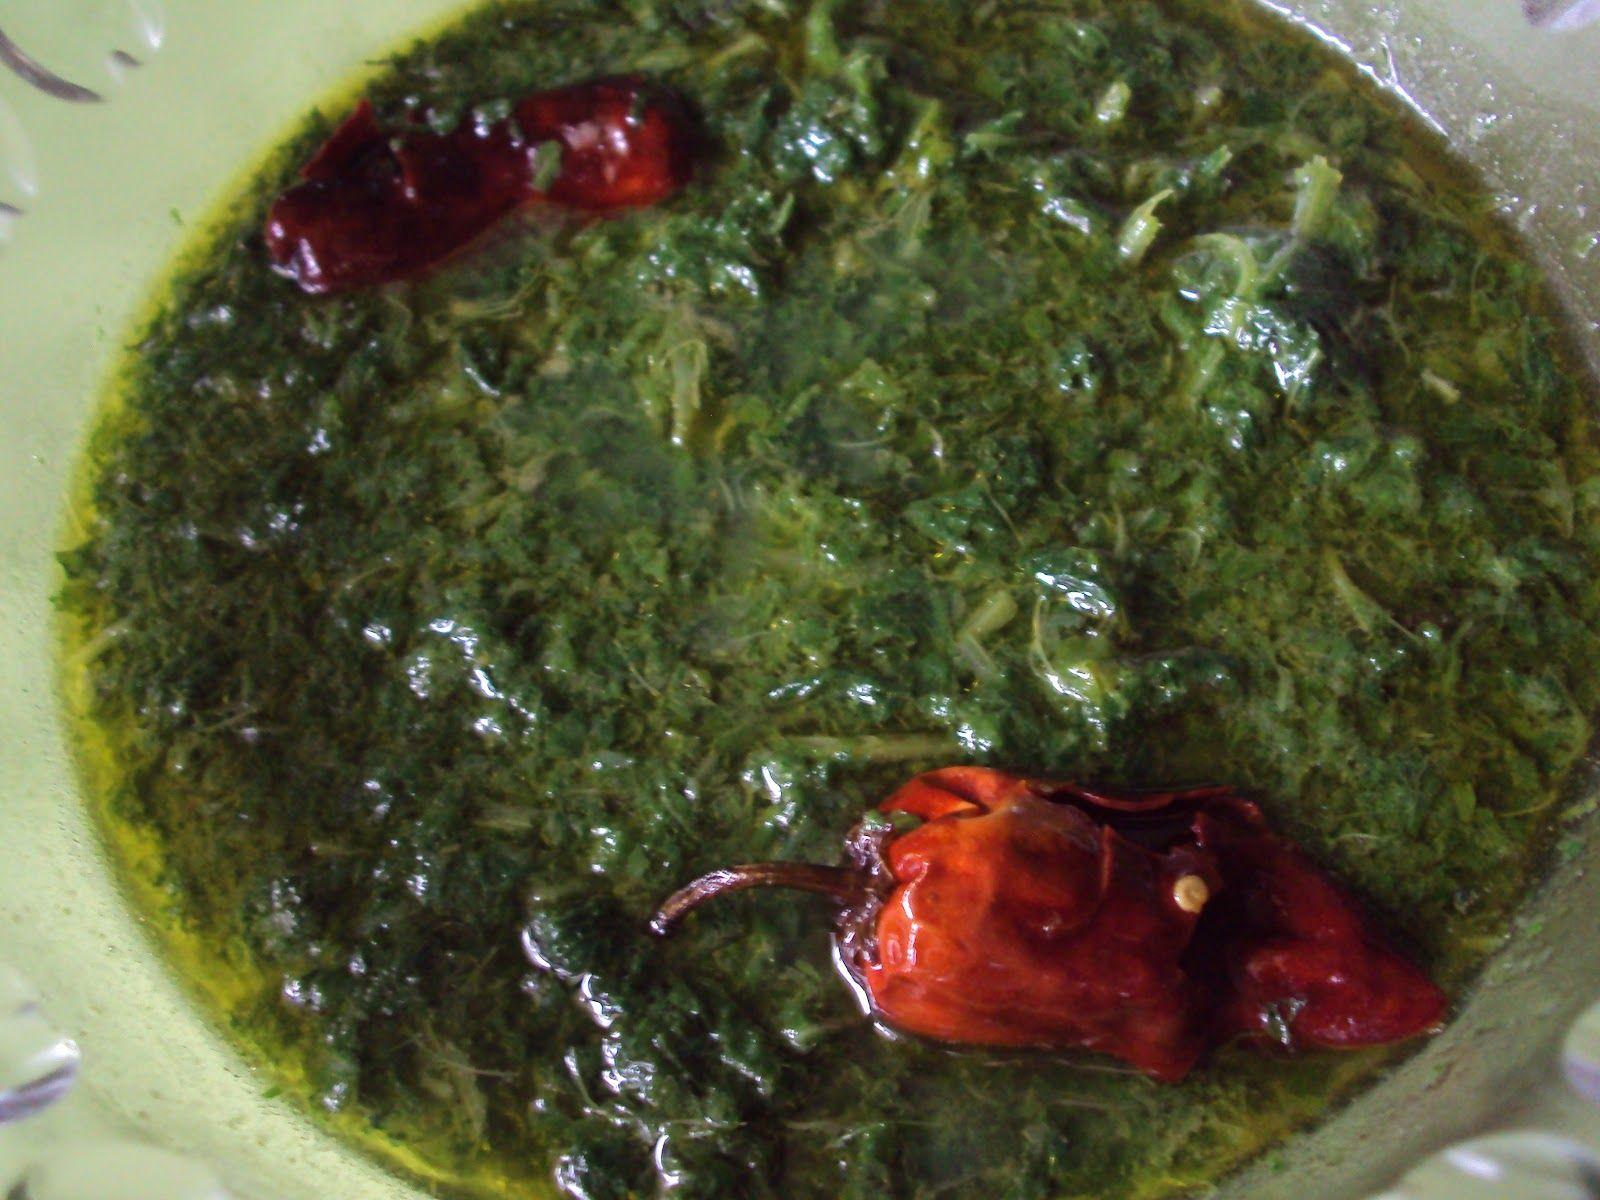 Kashmiri food recipes gogji hakh nothing like good old indian kashmiri food recipes gogji hakh forumfinder Gallery